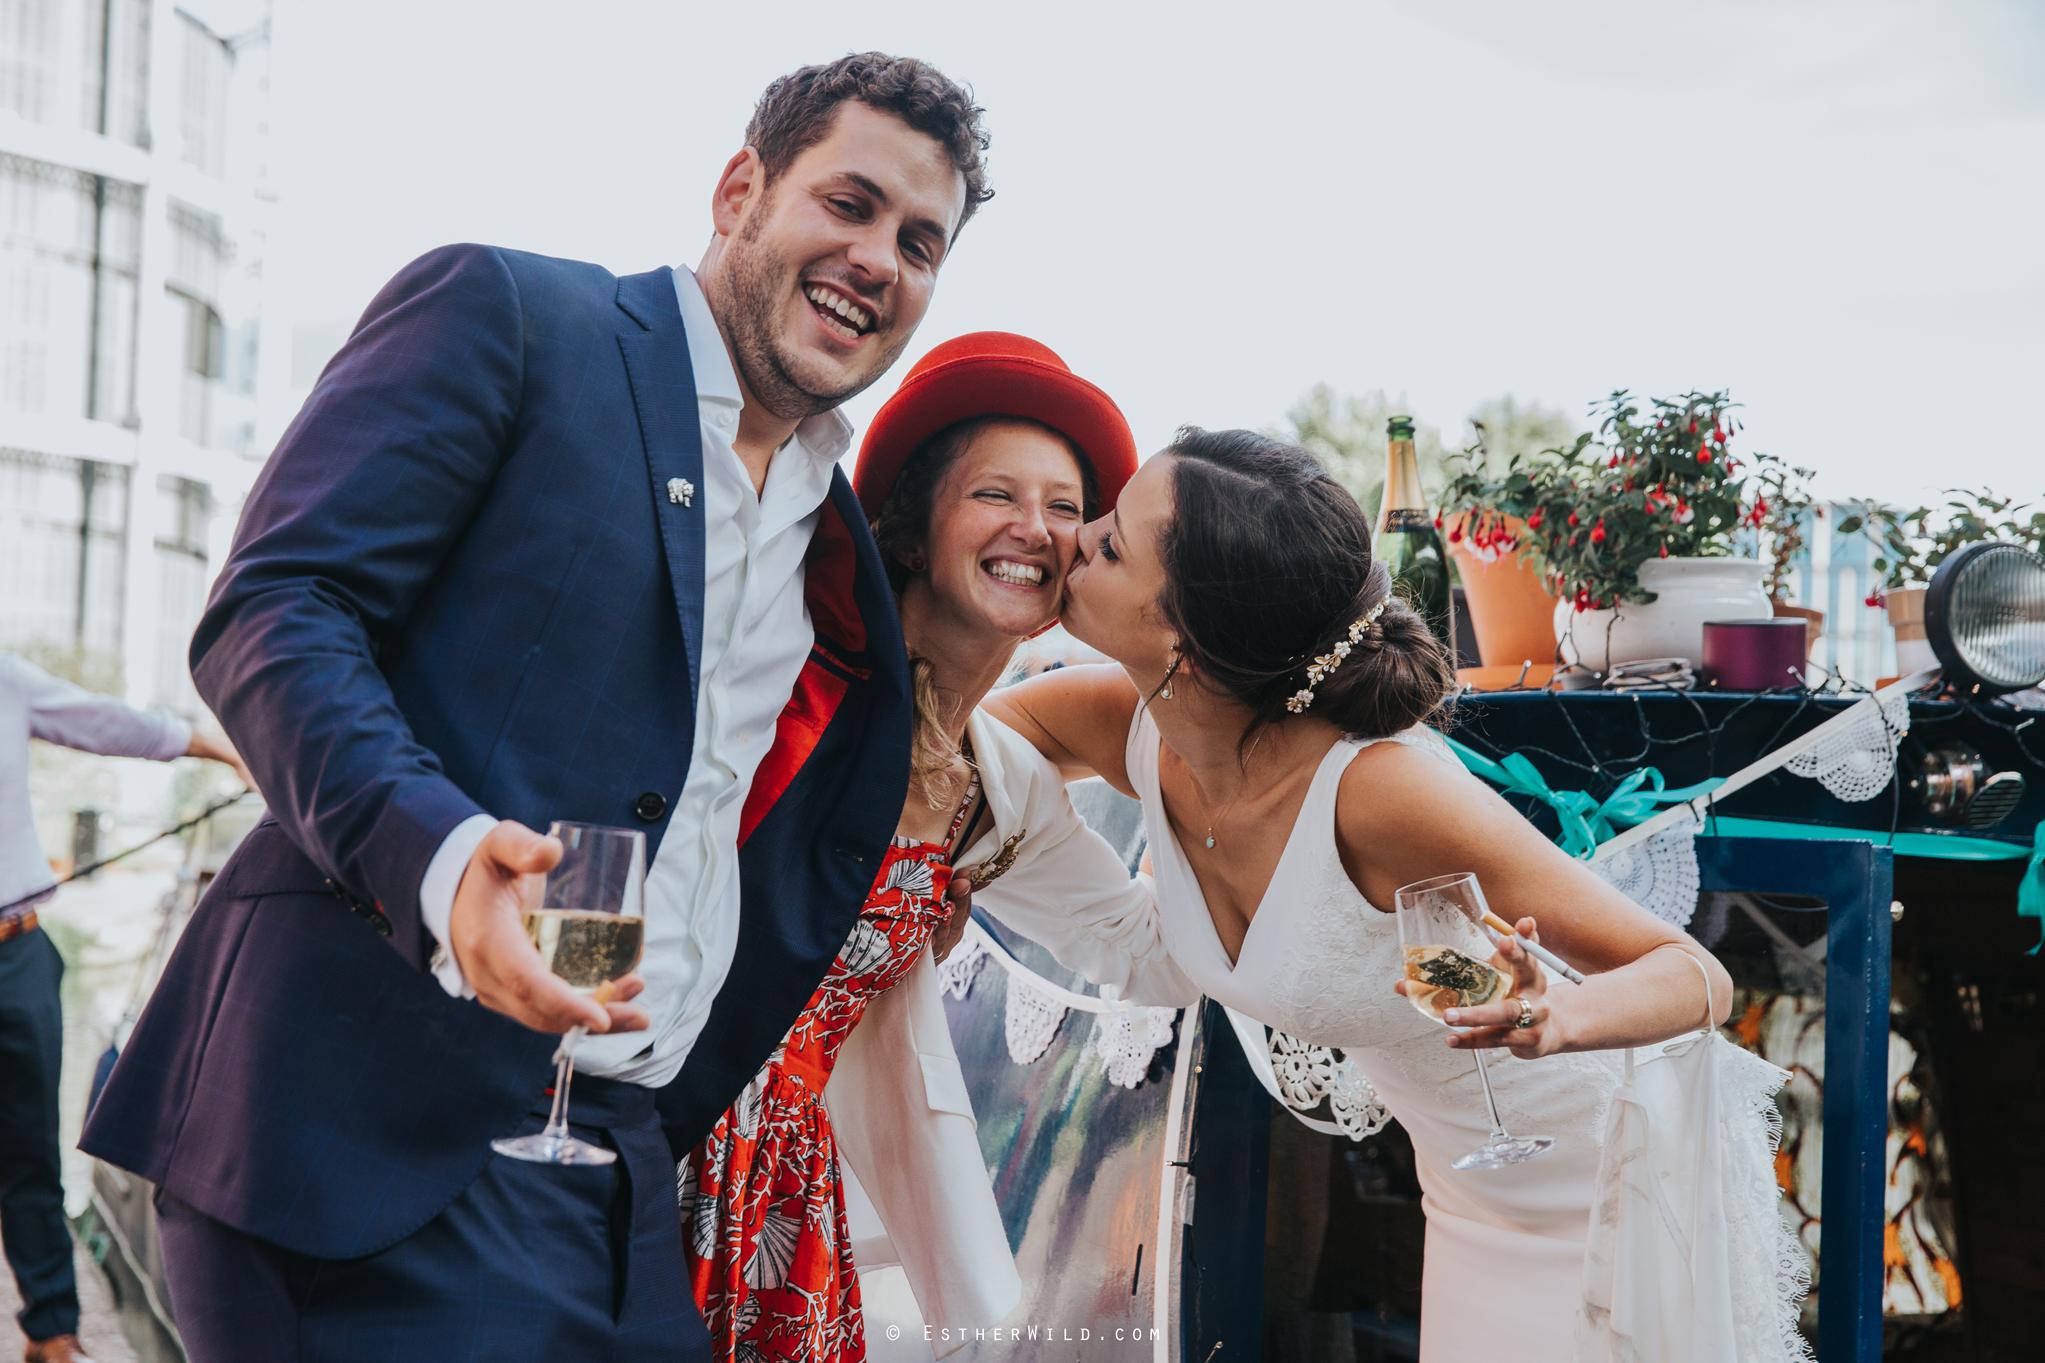 Islington_Town_Hall_Wedding_London_Photographer_Esther_Wild_IMG_6804.jpg